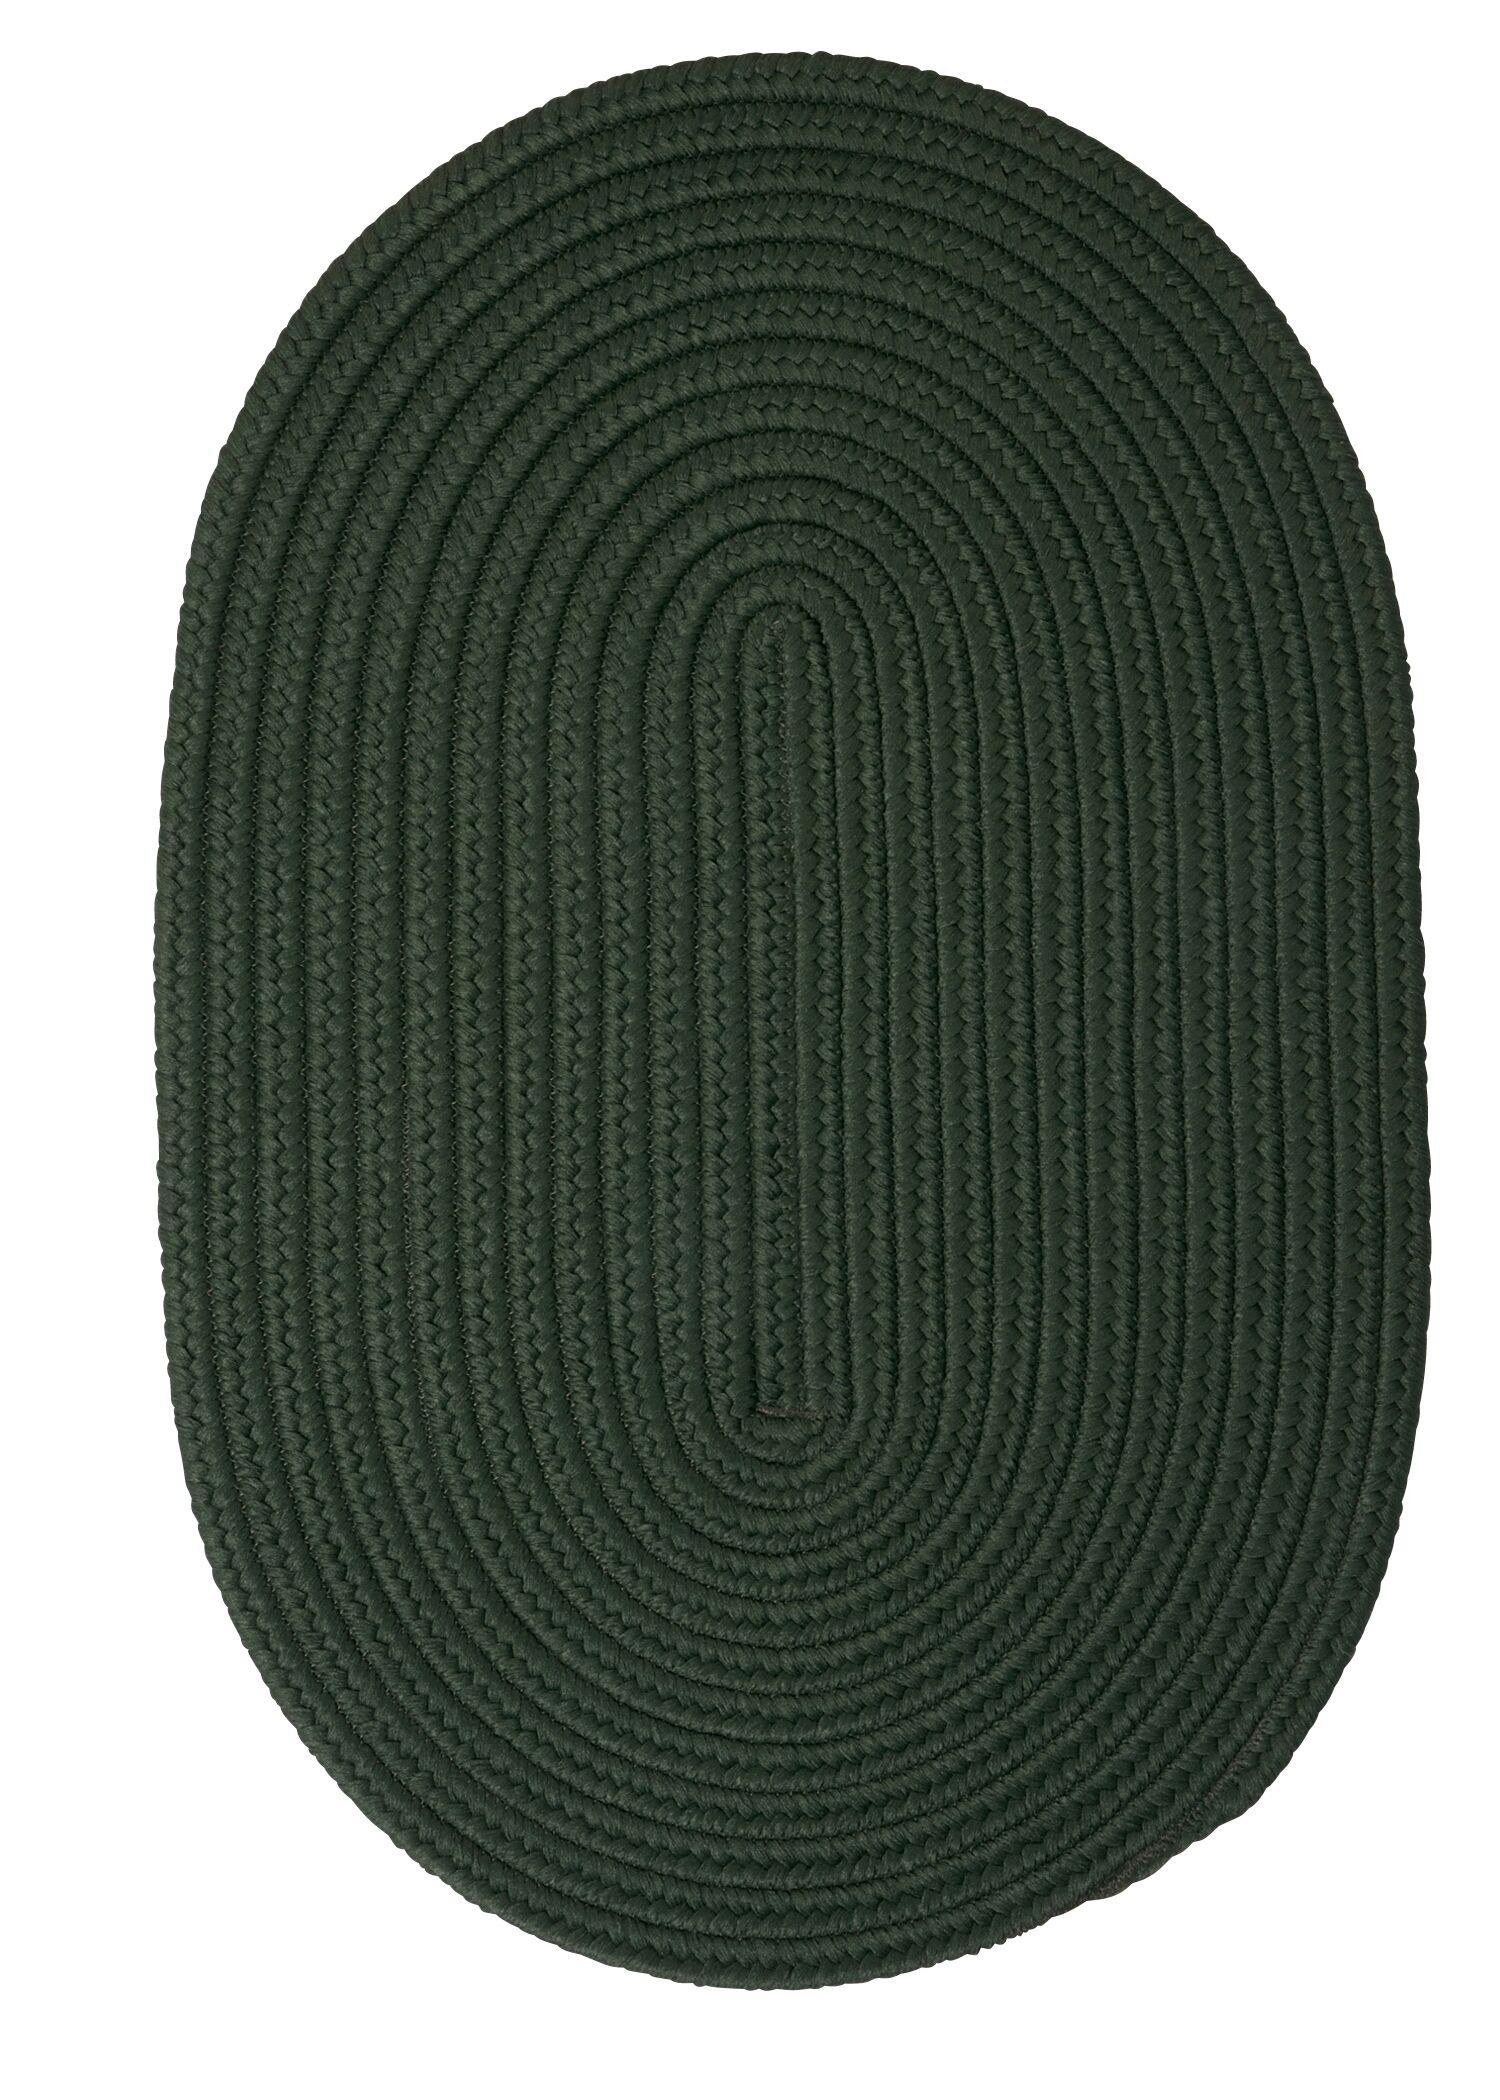 Mcintyre Dark Green Outdoor Area Rug Rug Size: Oval 8' x 11'